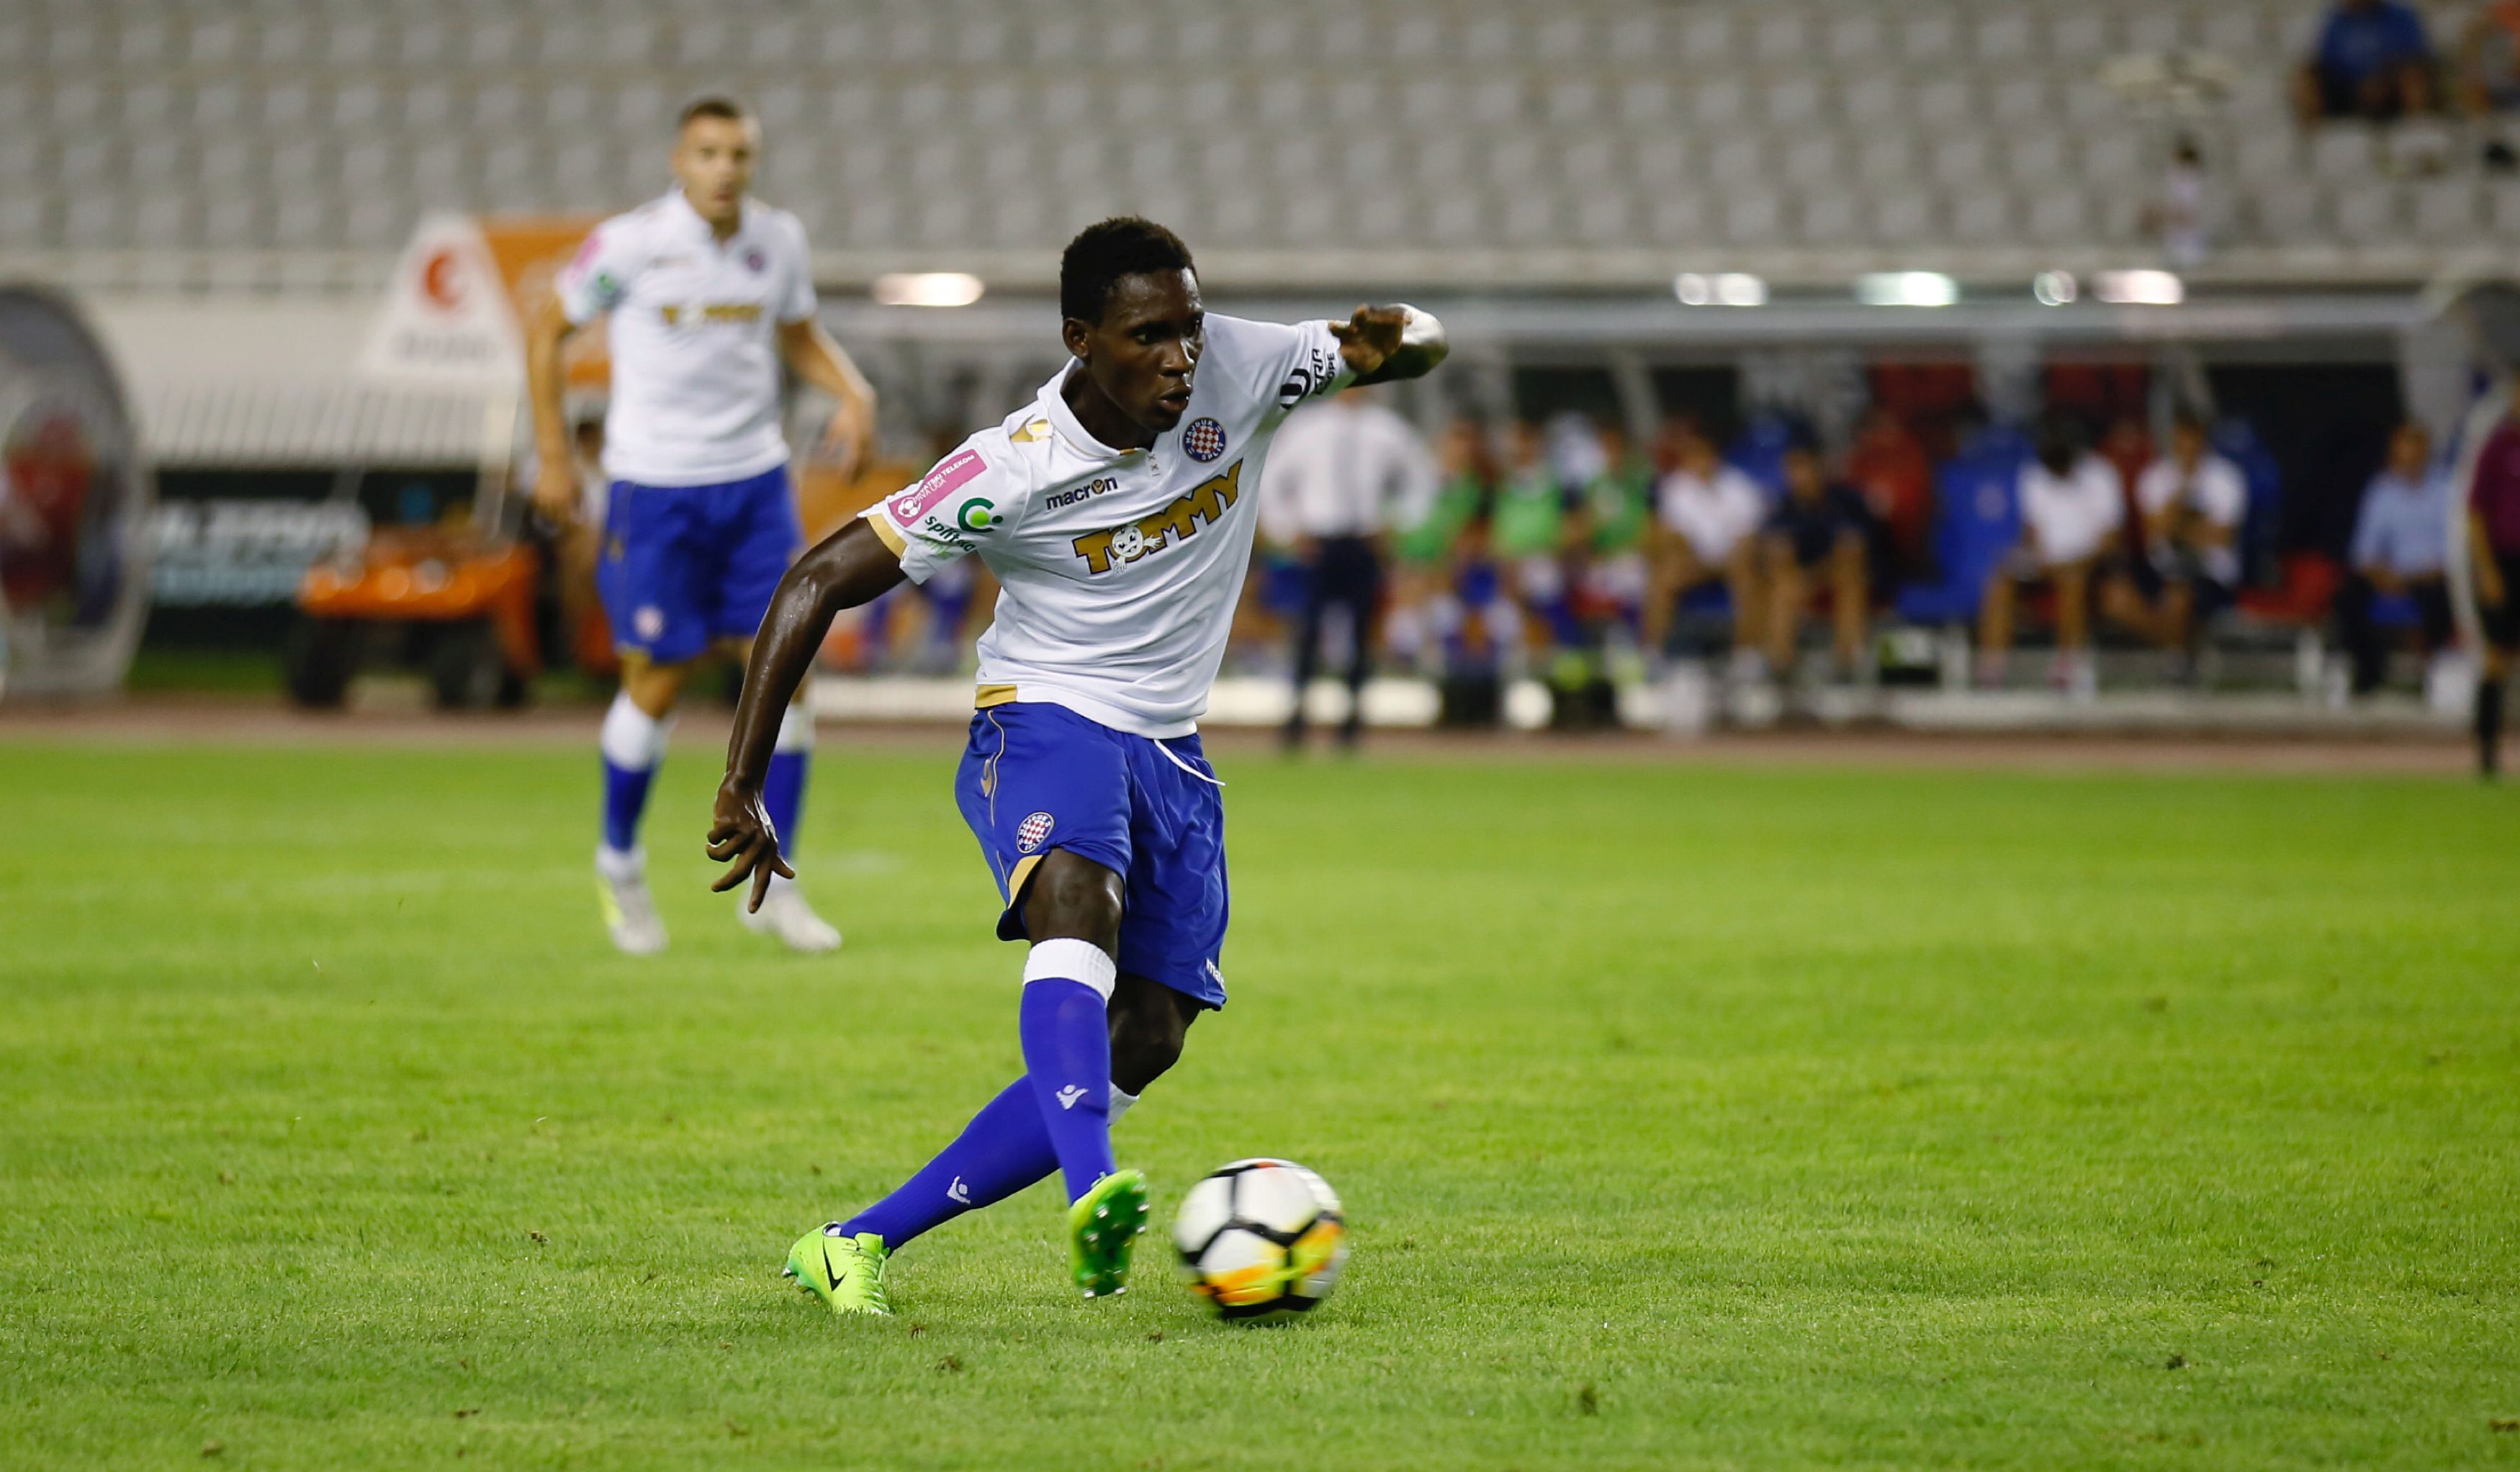 EL Everton – Hajduk 2-0